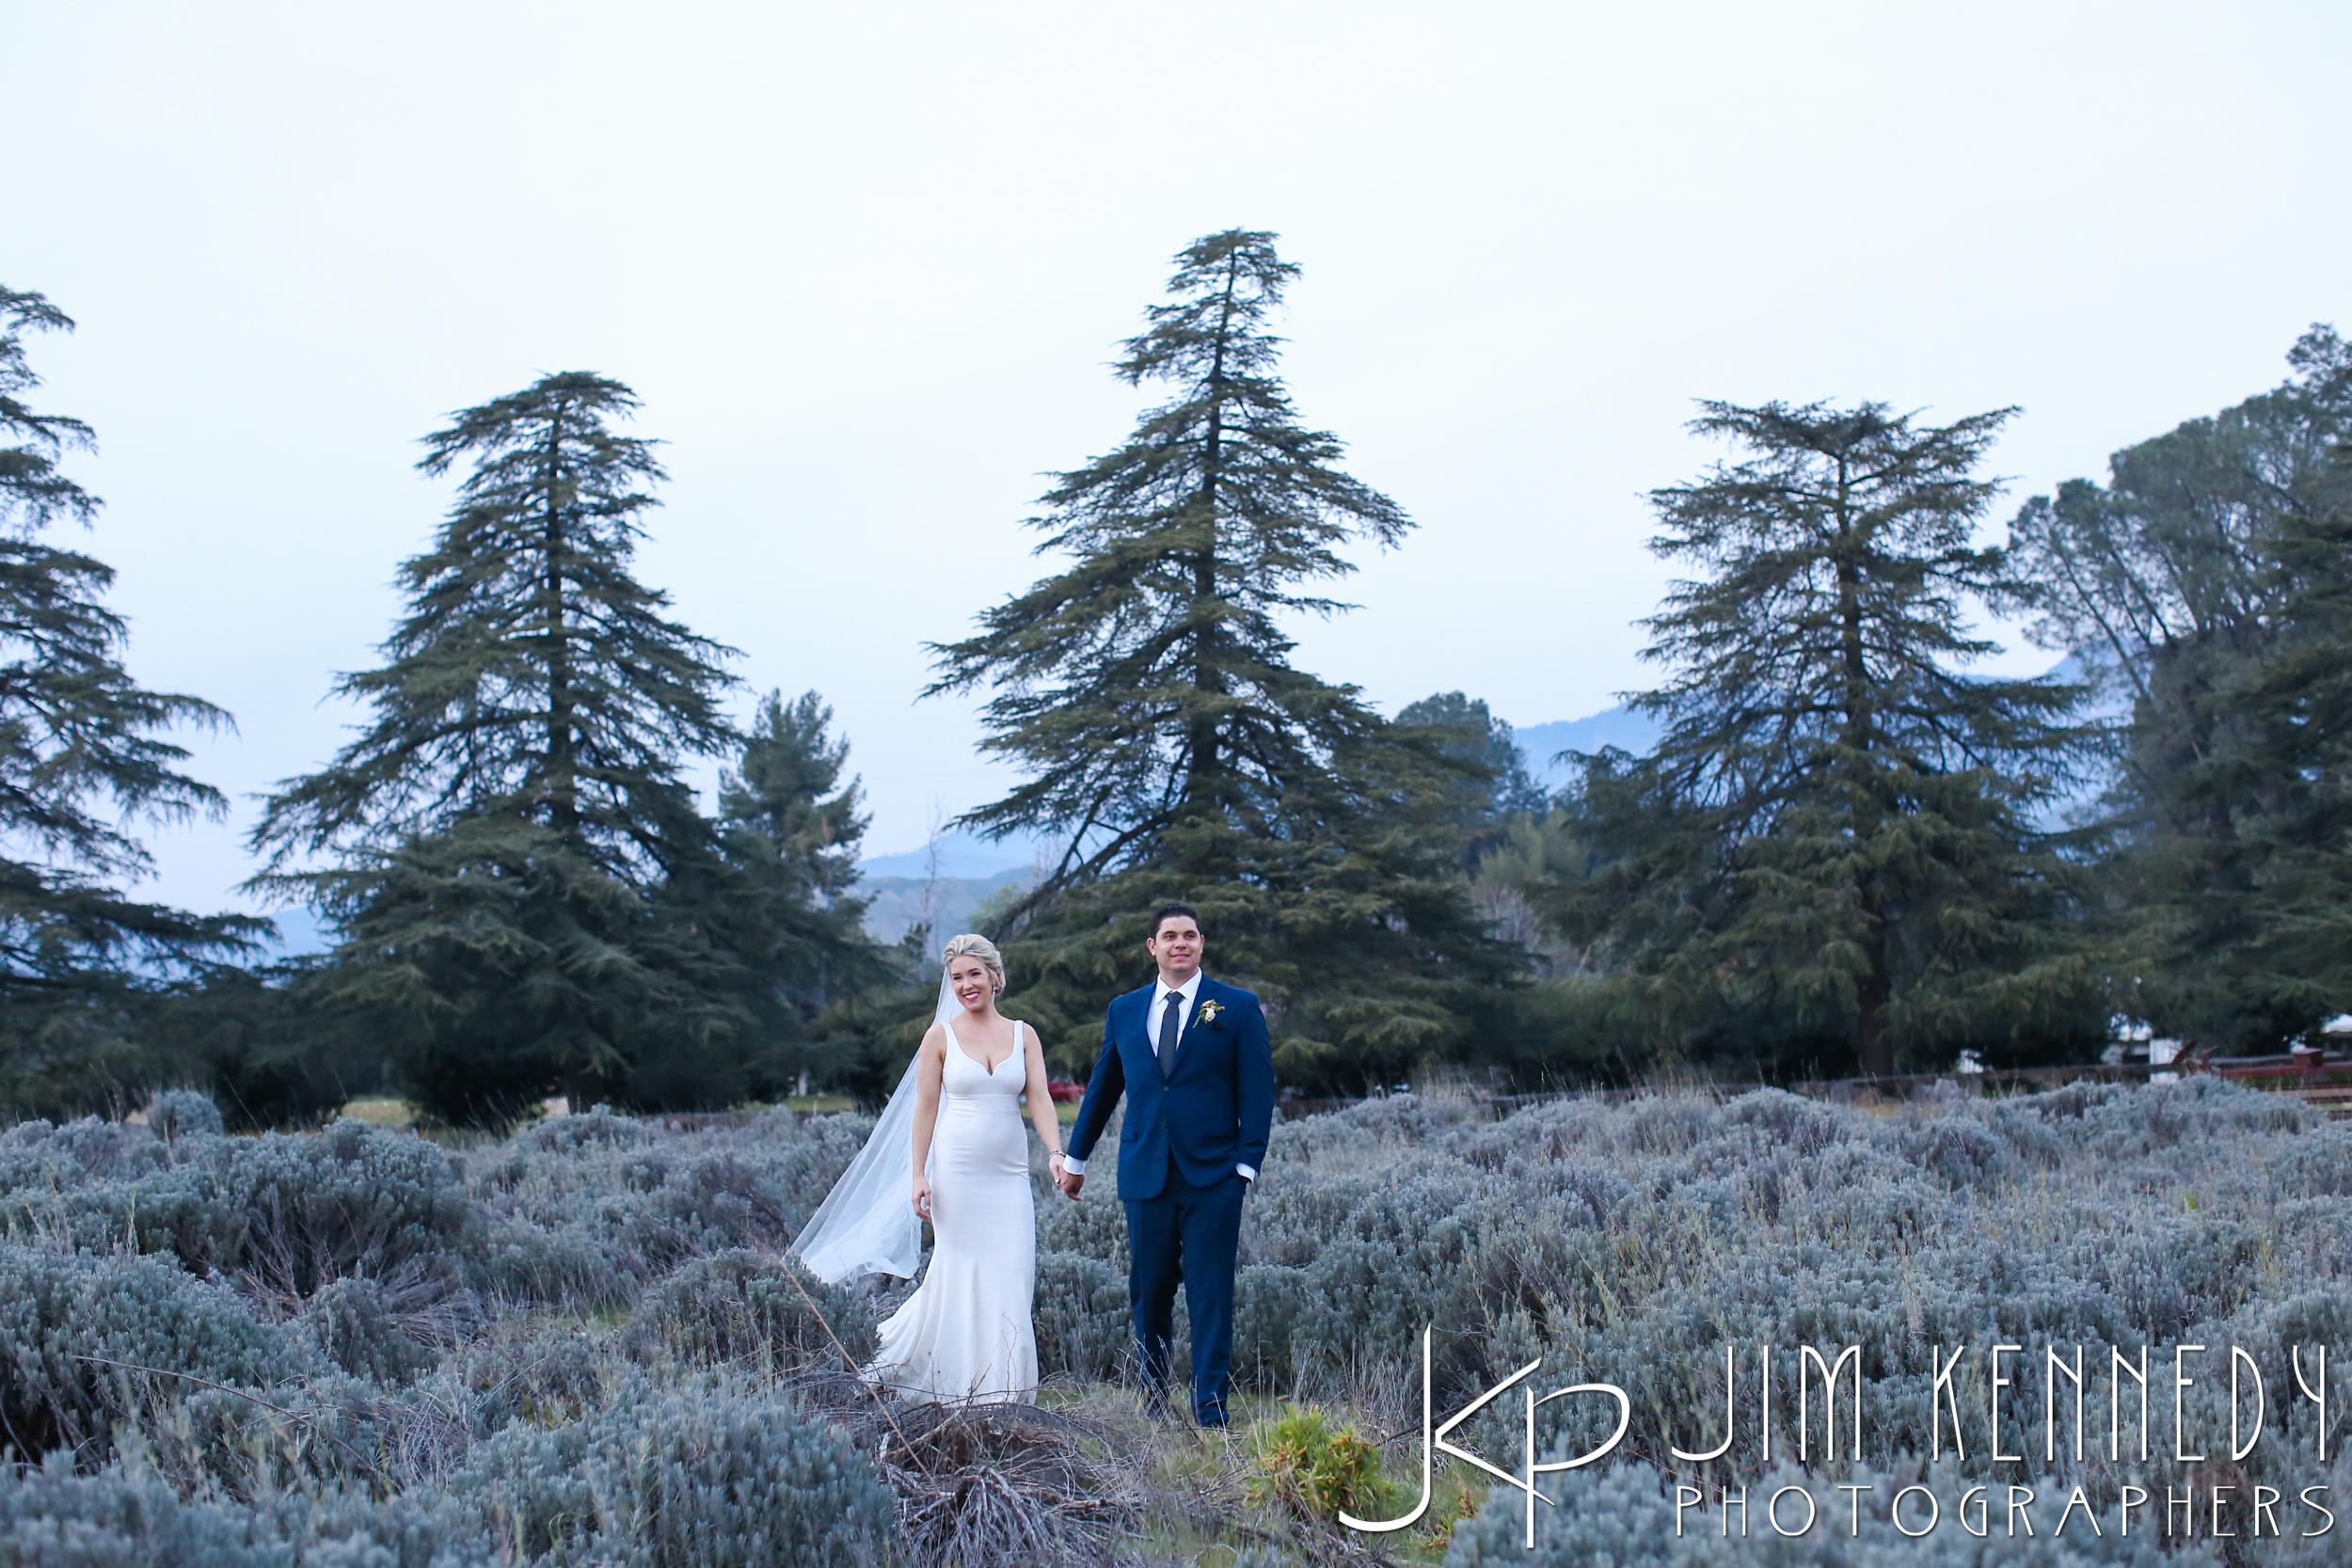 jim_kennedy_photographers_highland_springs_wedding_caitlyn_0157.jpg